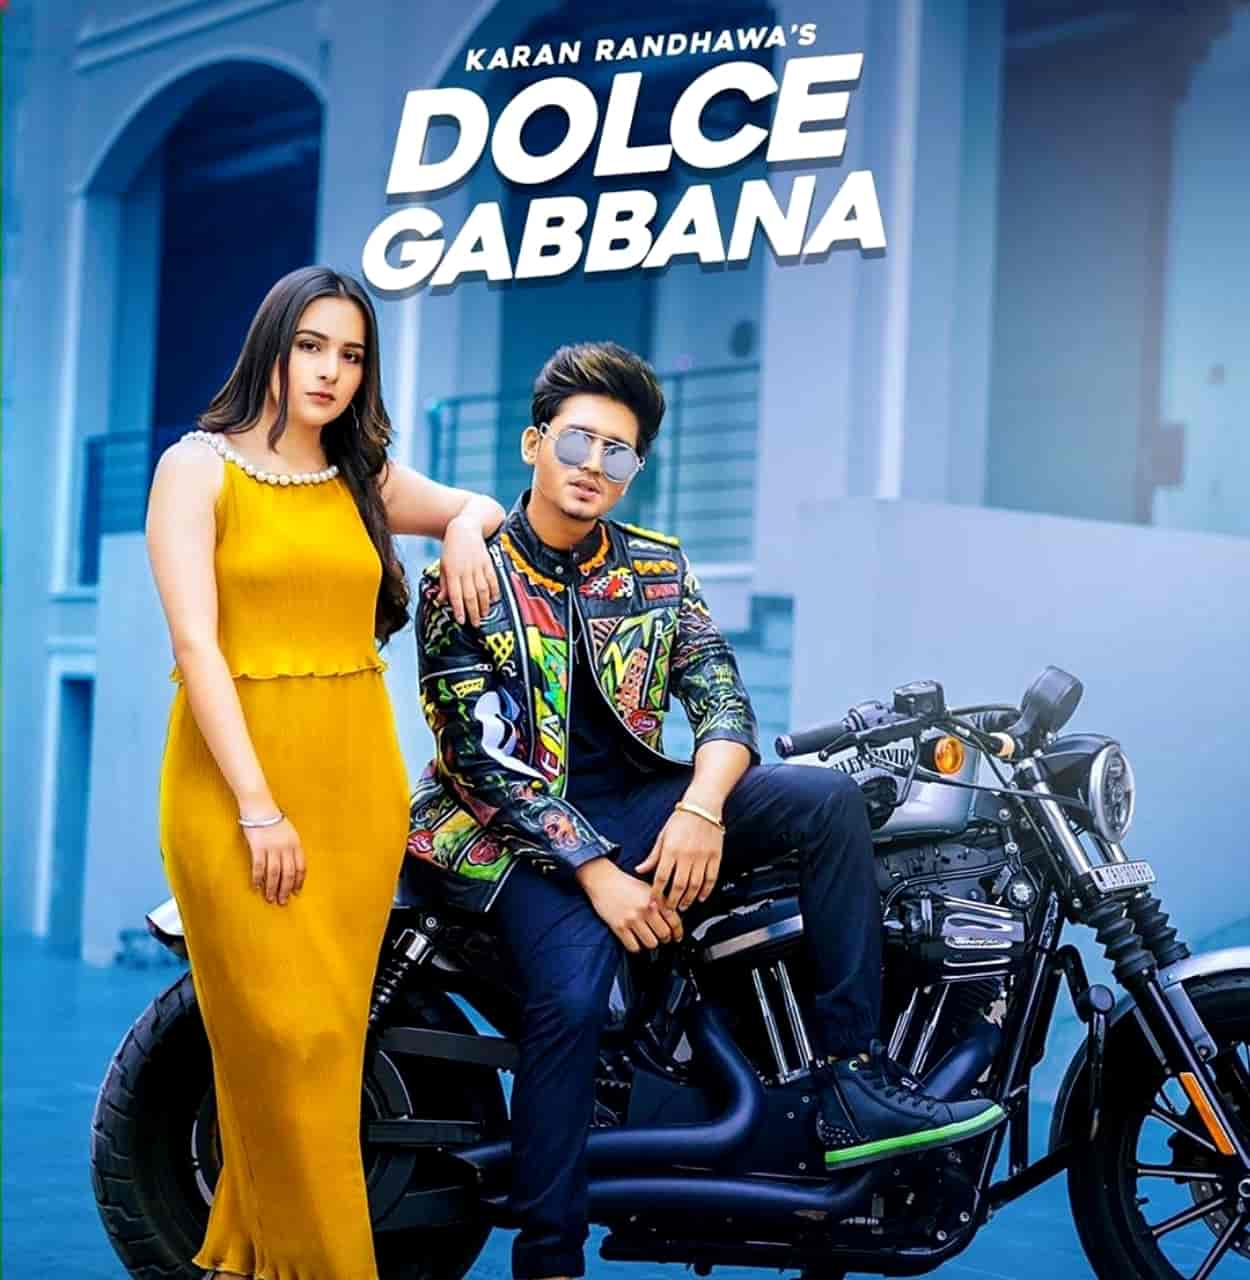 Dolce Gabbana Song Images By Karan Randhawa